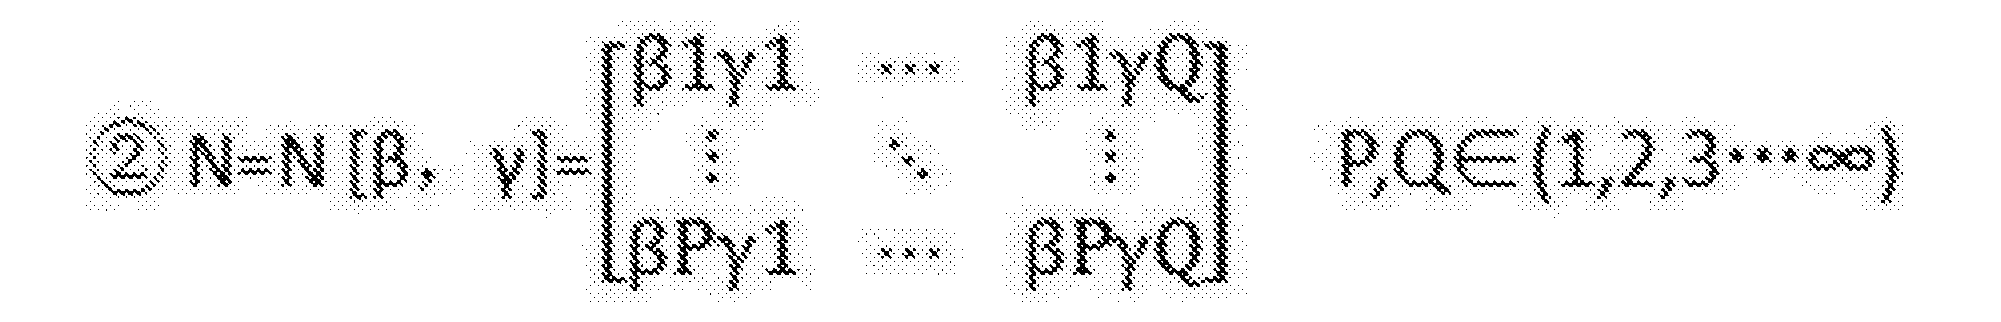 Figure CN108447294AD00061